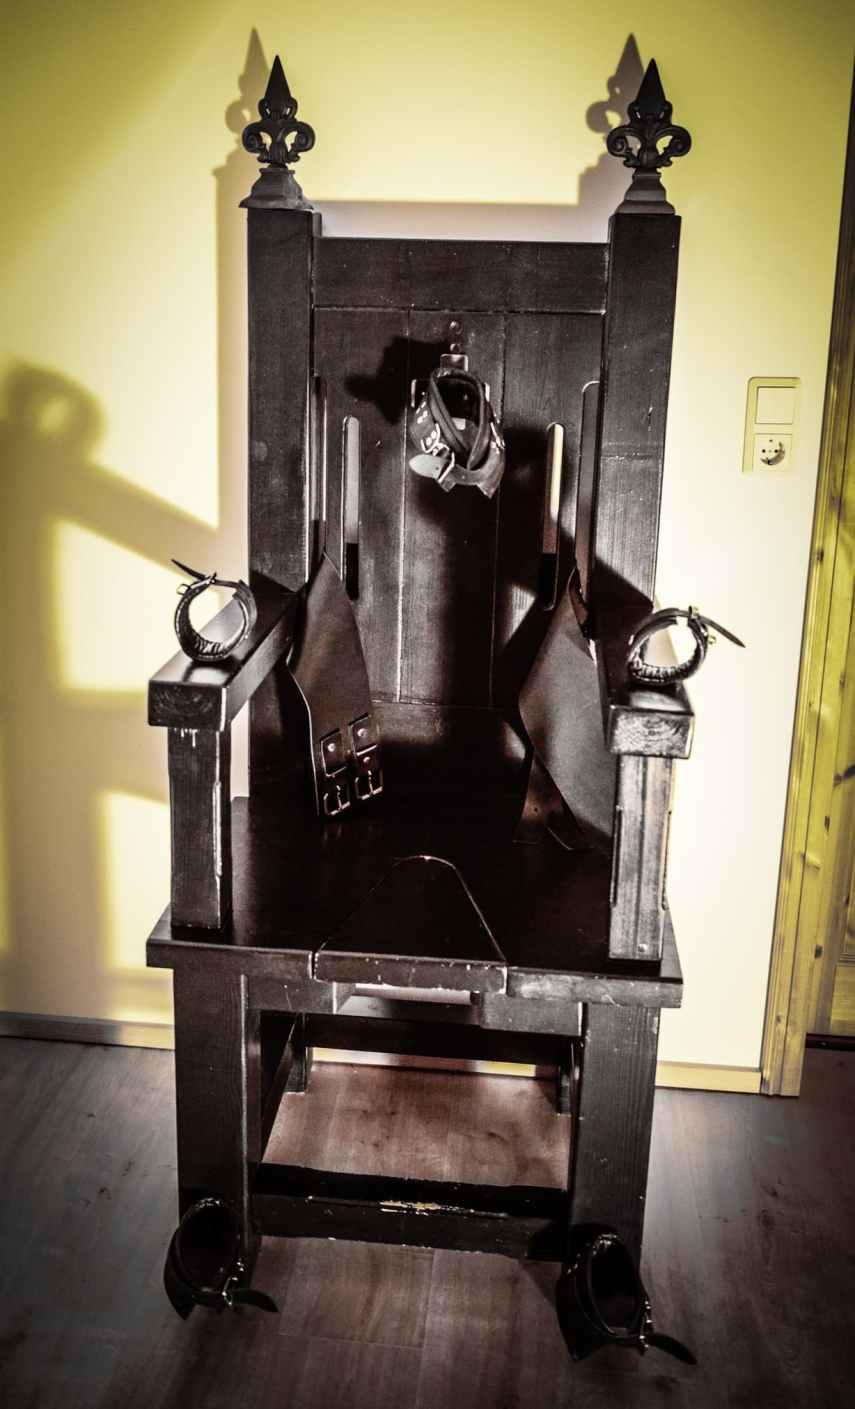 Sklavenstuhl BDSM Haus